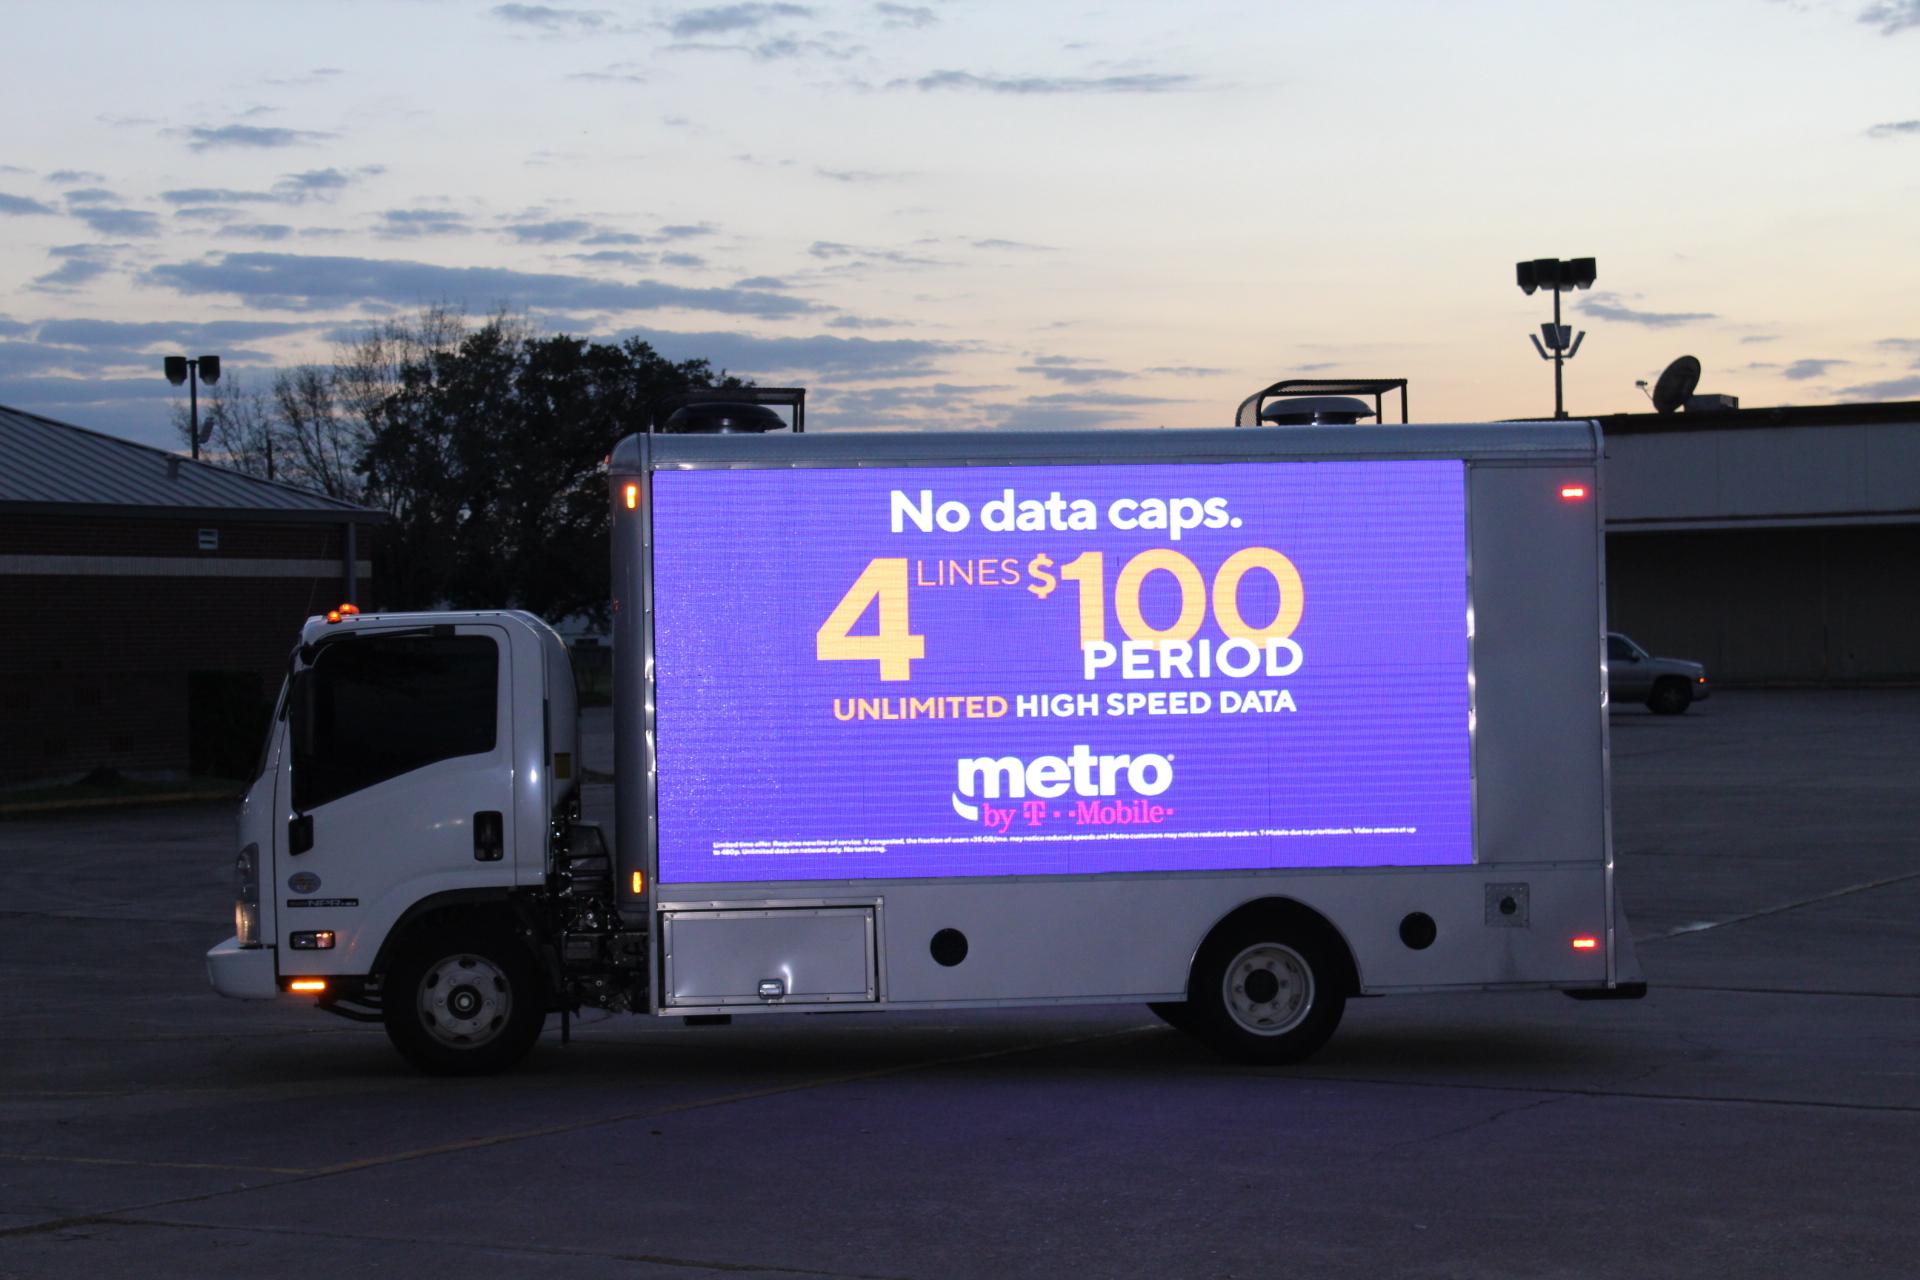 Louisiana Mobile Billboard - Metropcs Digital LED Mobile Billboard truck